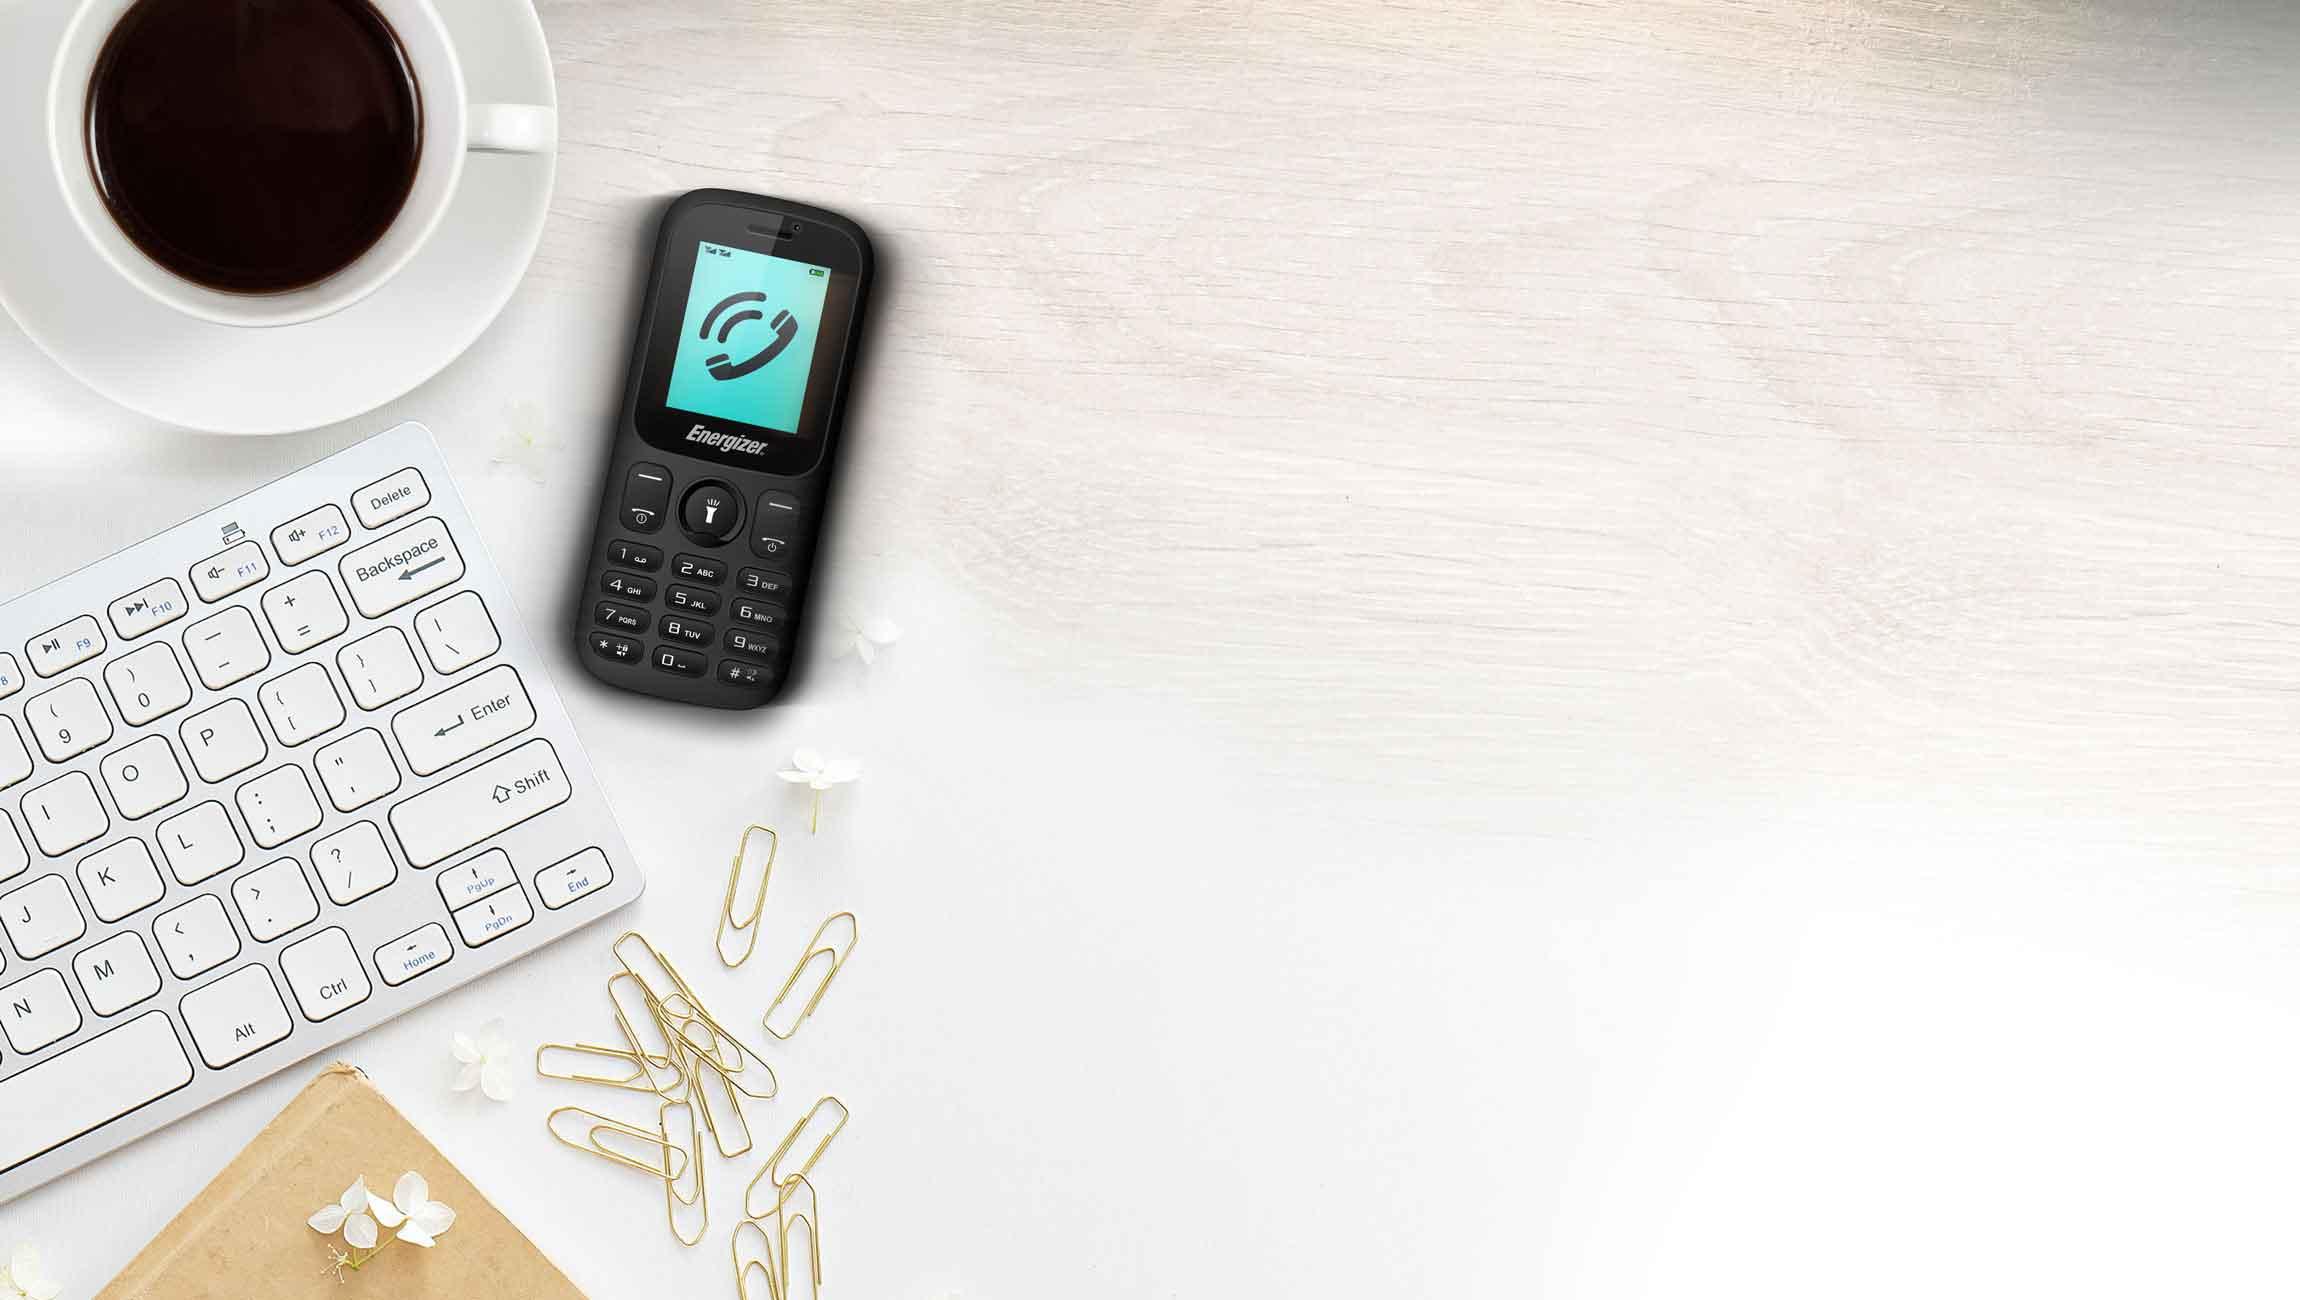 1 AT E10plus vibreur - گوشی موبایل انرجایزر مدل Energy E10 Plus دو سیم کارت